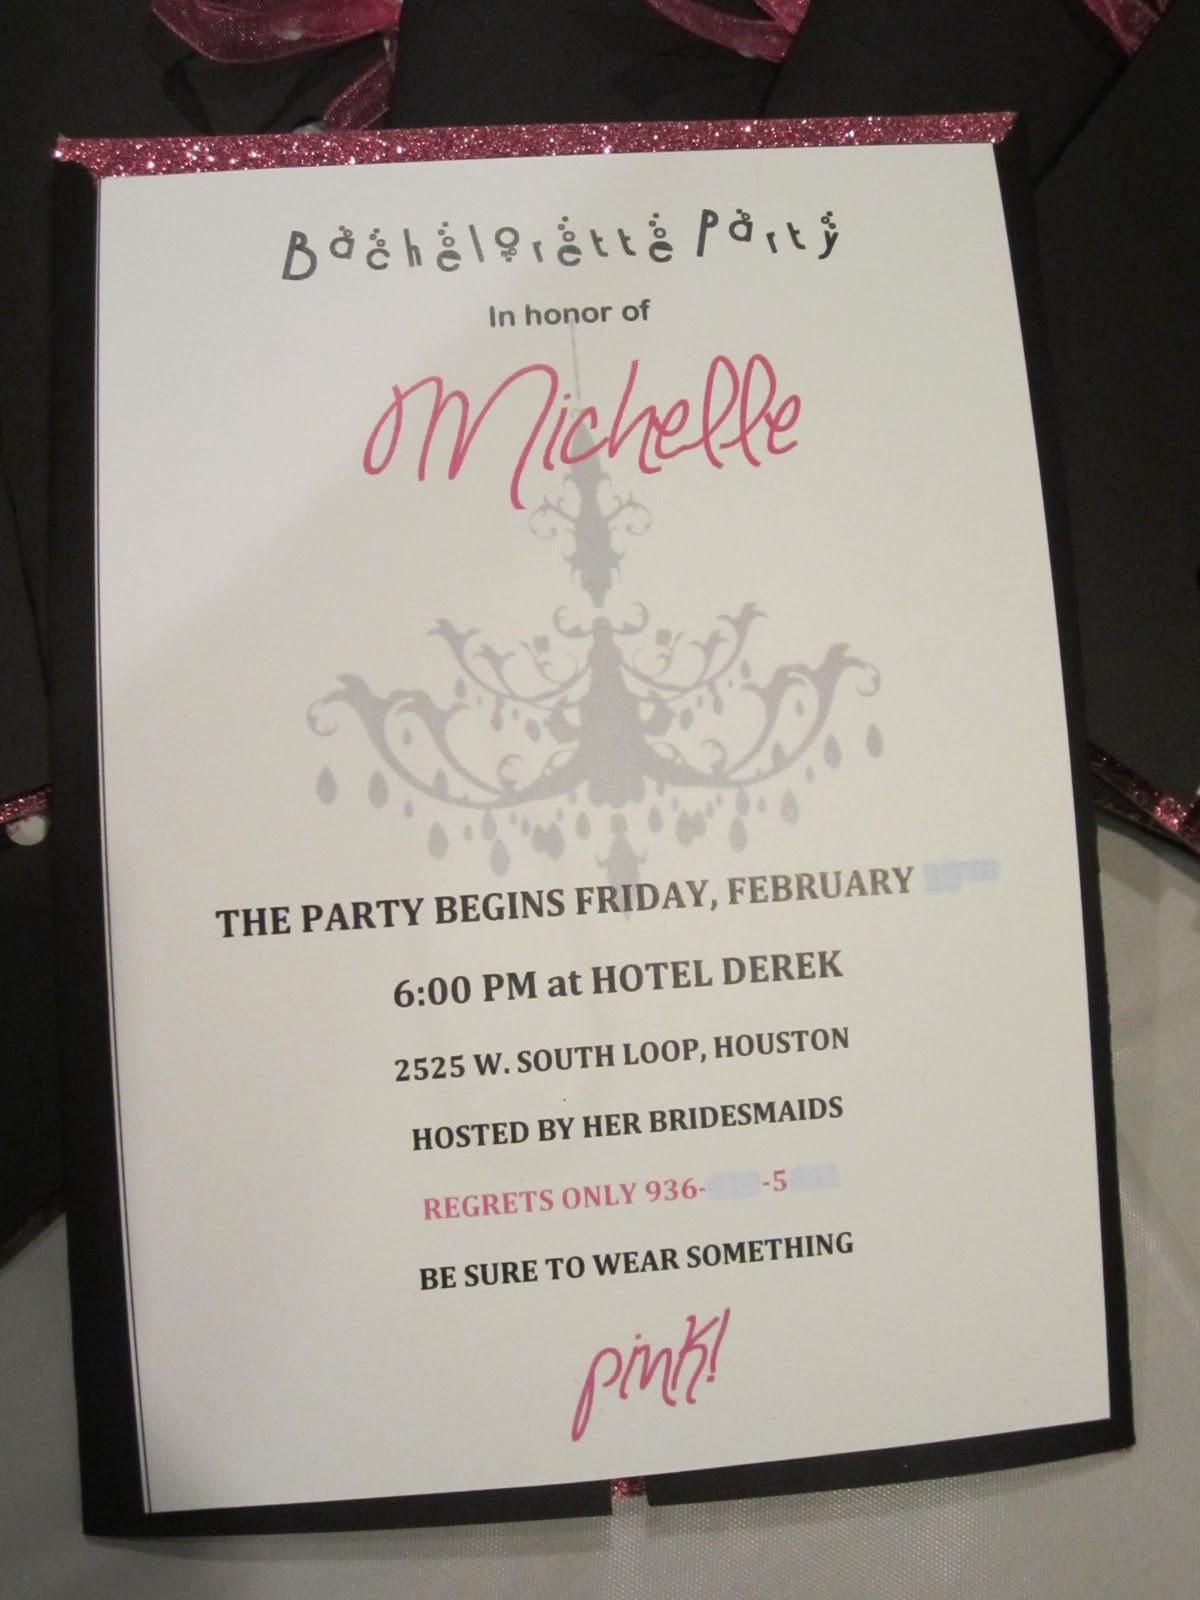 http://3.bp.blogspot.com/-jtVuWRLWW-g/TyLmdFamRPI/AAAAAAAAARk/K4eMVLyf5bU/s1600/invitation.JPG